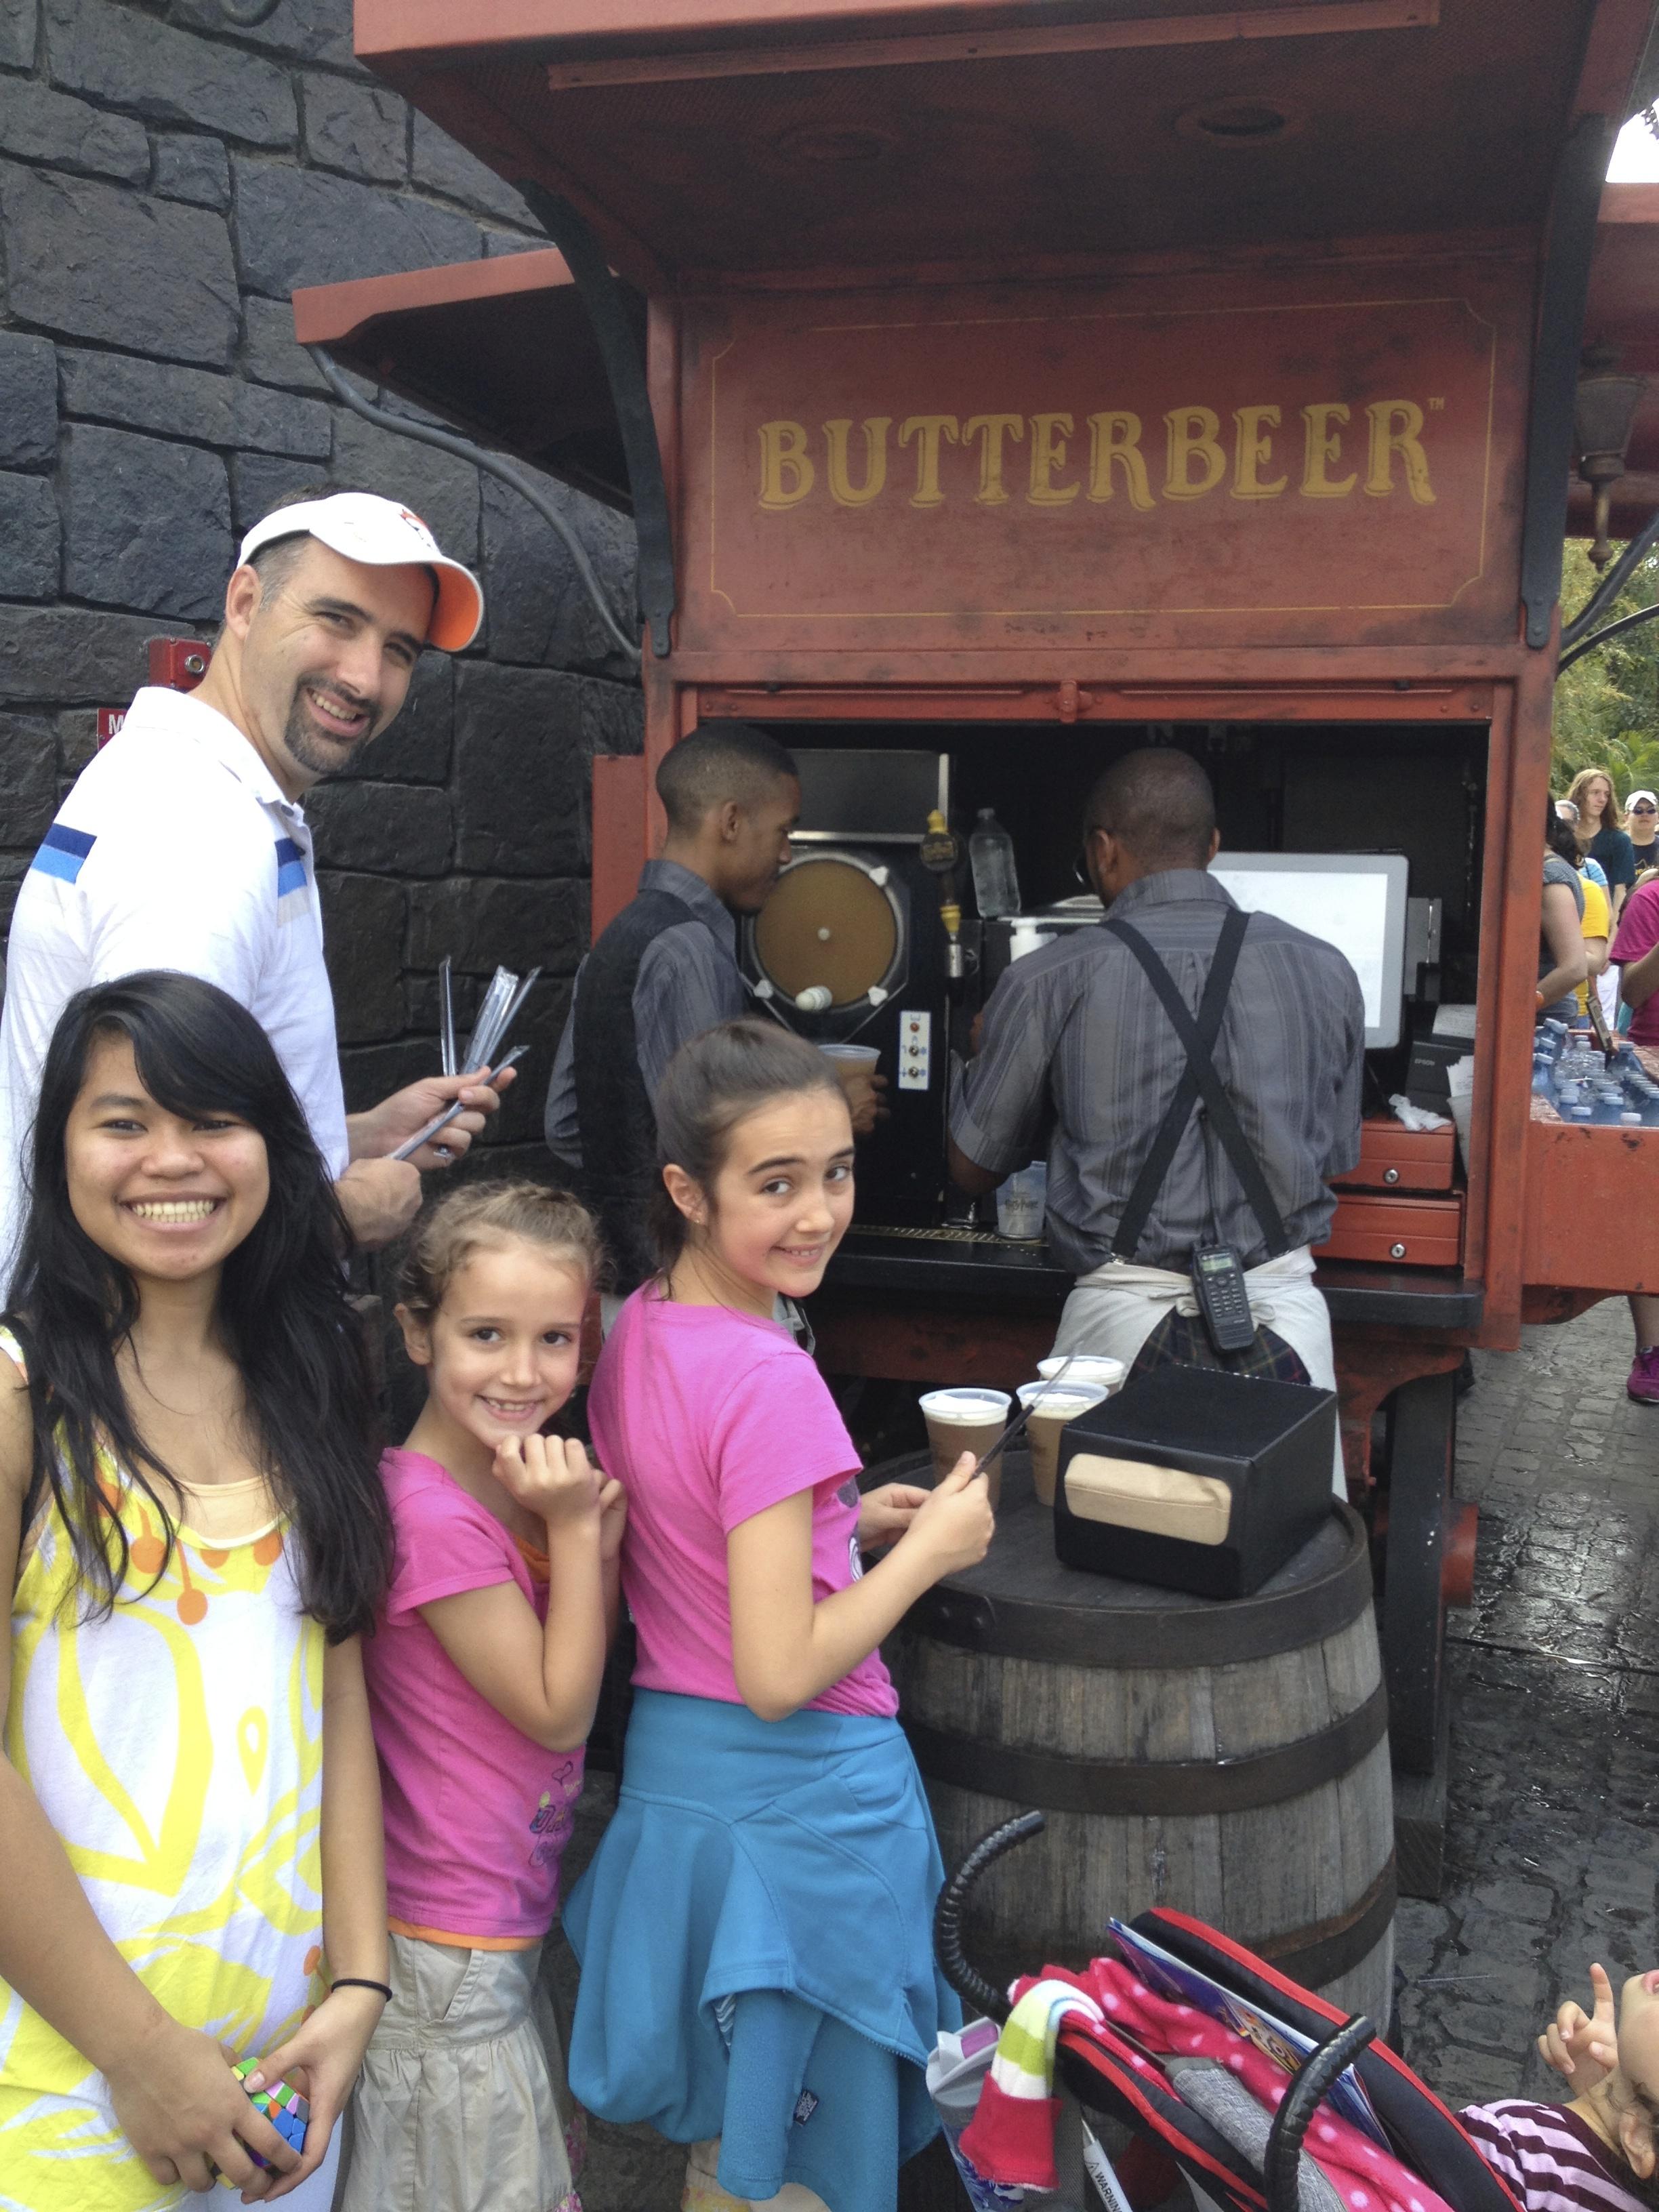 Butterbeer is delicious.